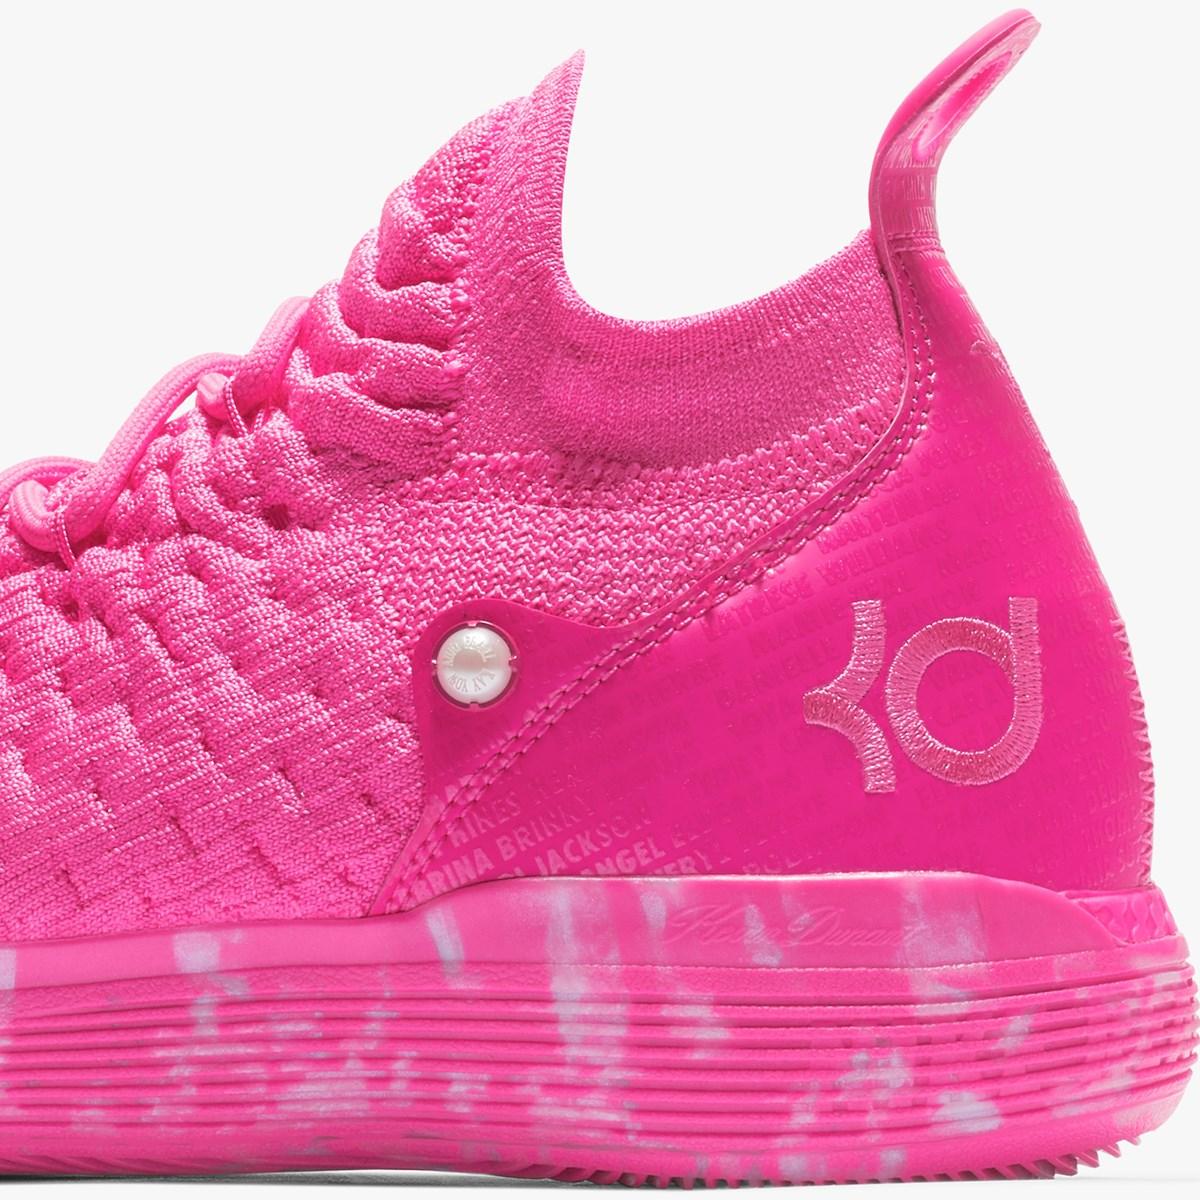 3f7ddec38eb2 Nike Zoom KD11 AP - Bv7721-600 - Sneakersnstuff